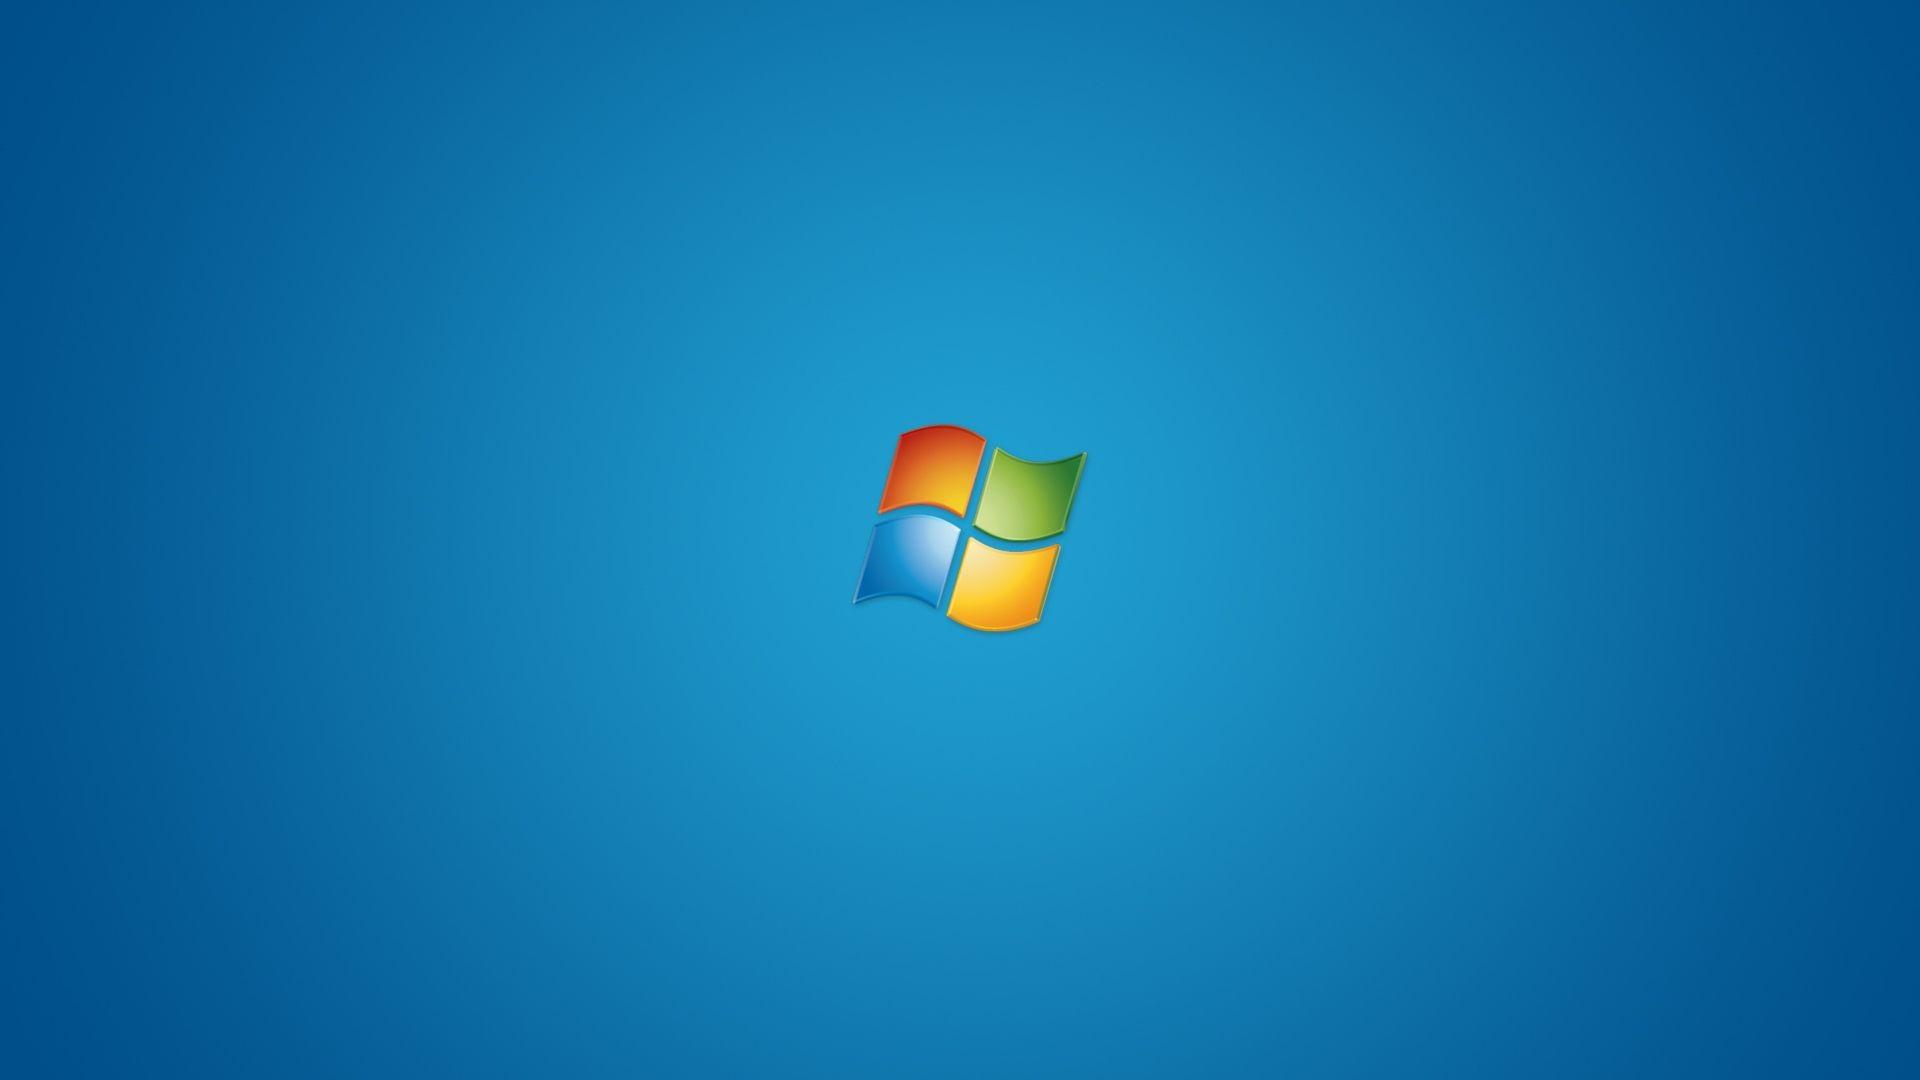 desktop wallpaper hd for windows 10,blue,operating system,azure,logo,graphics